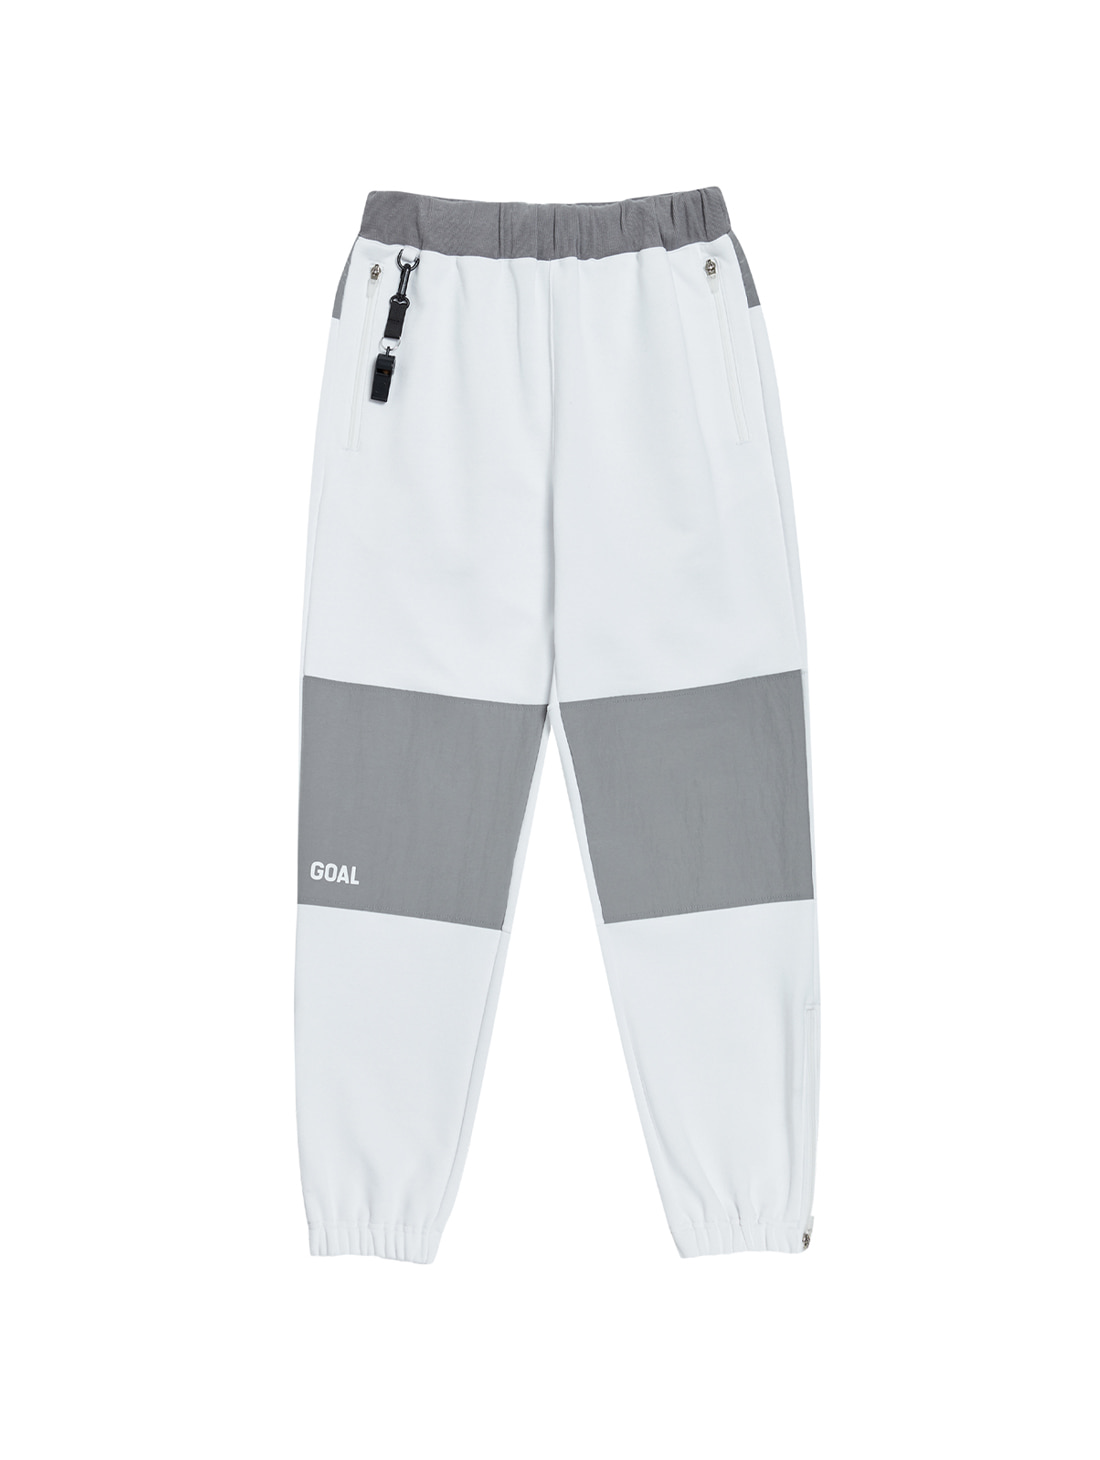 NYLON METAL MIXED TRACK PANTS - WHITE